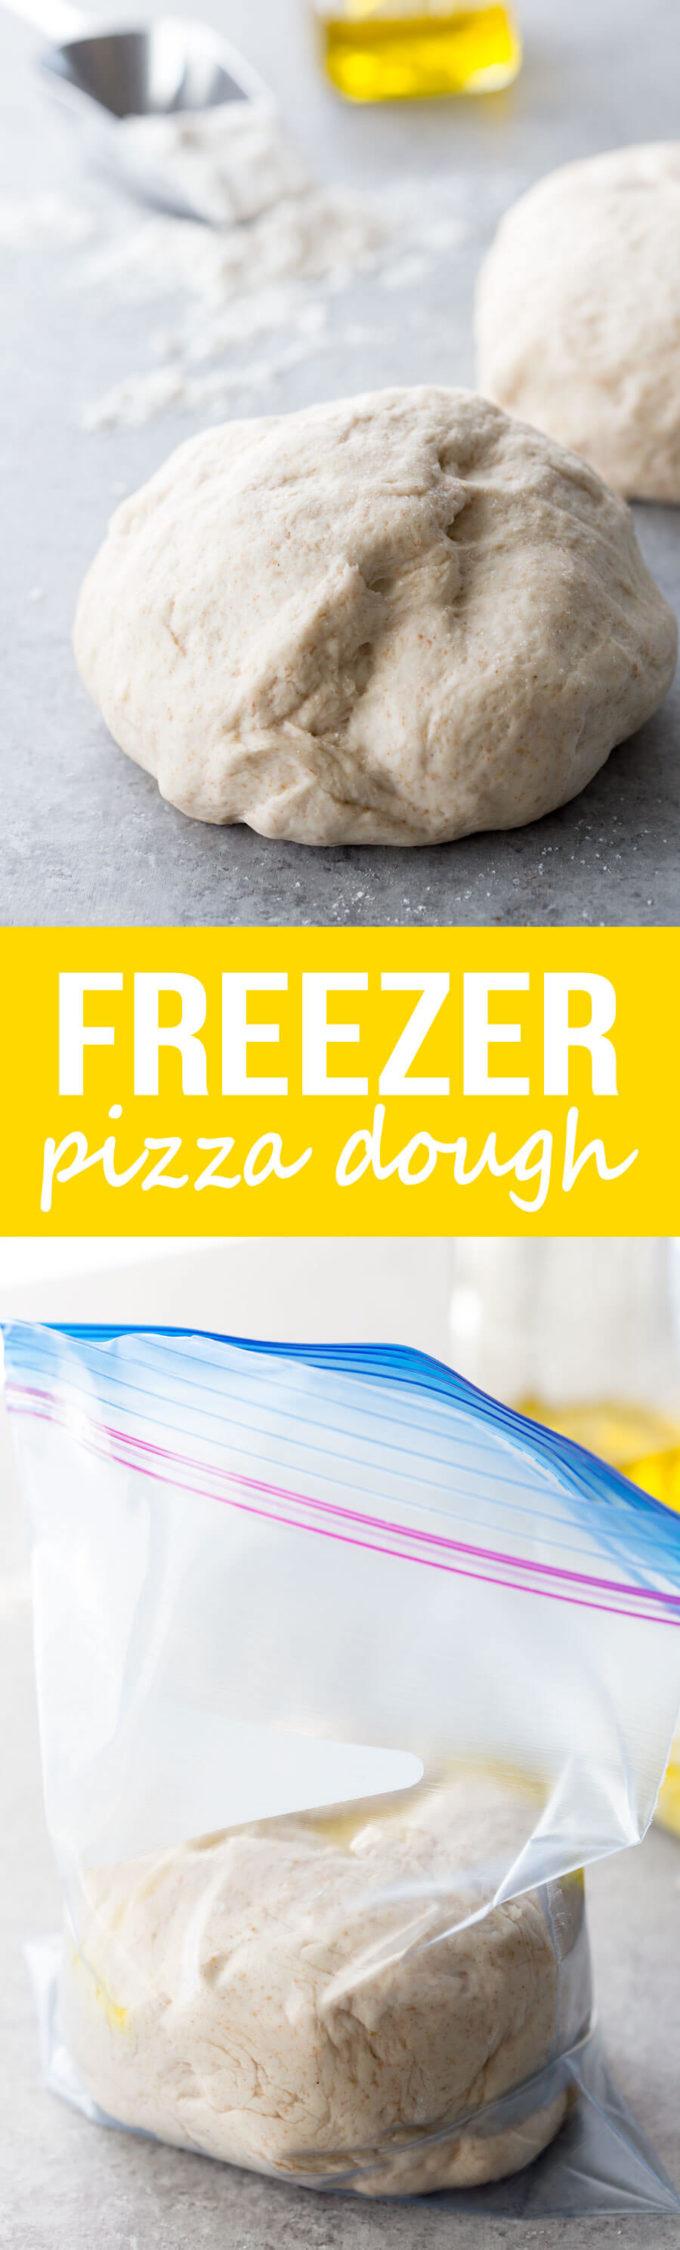 Freezer Pizza Dough